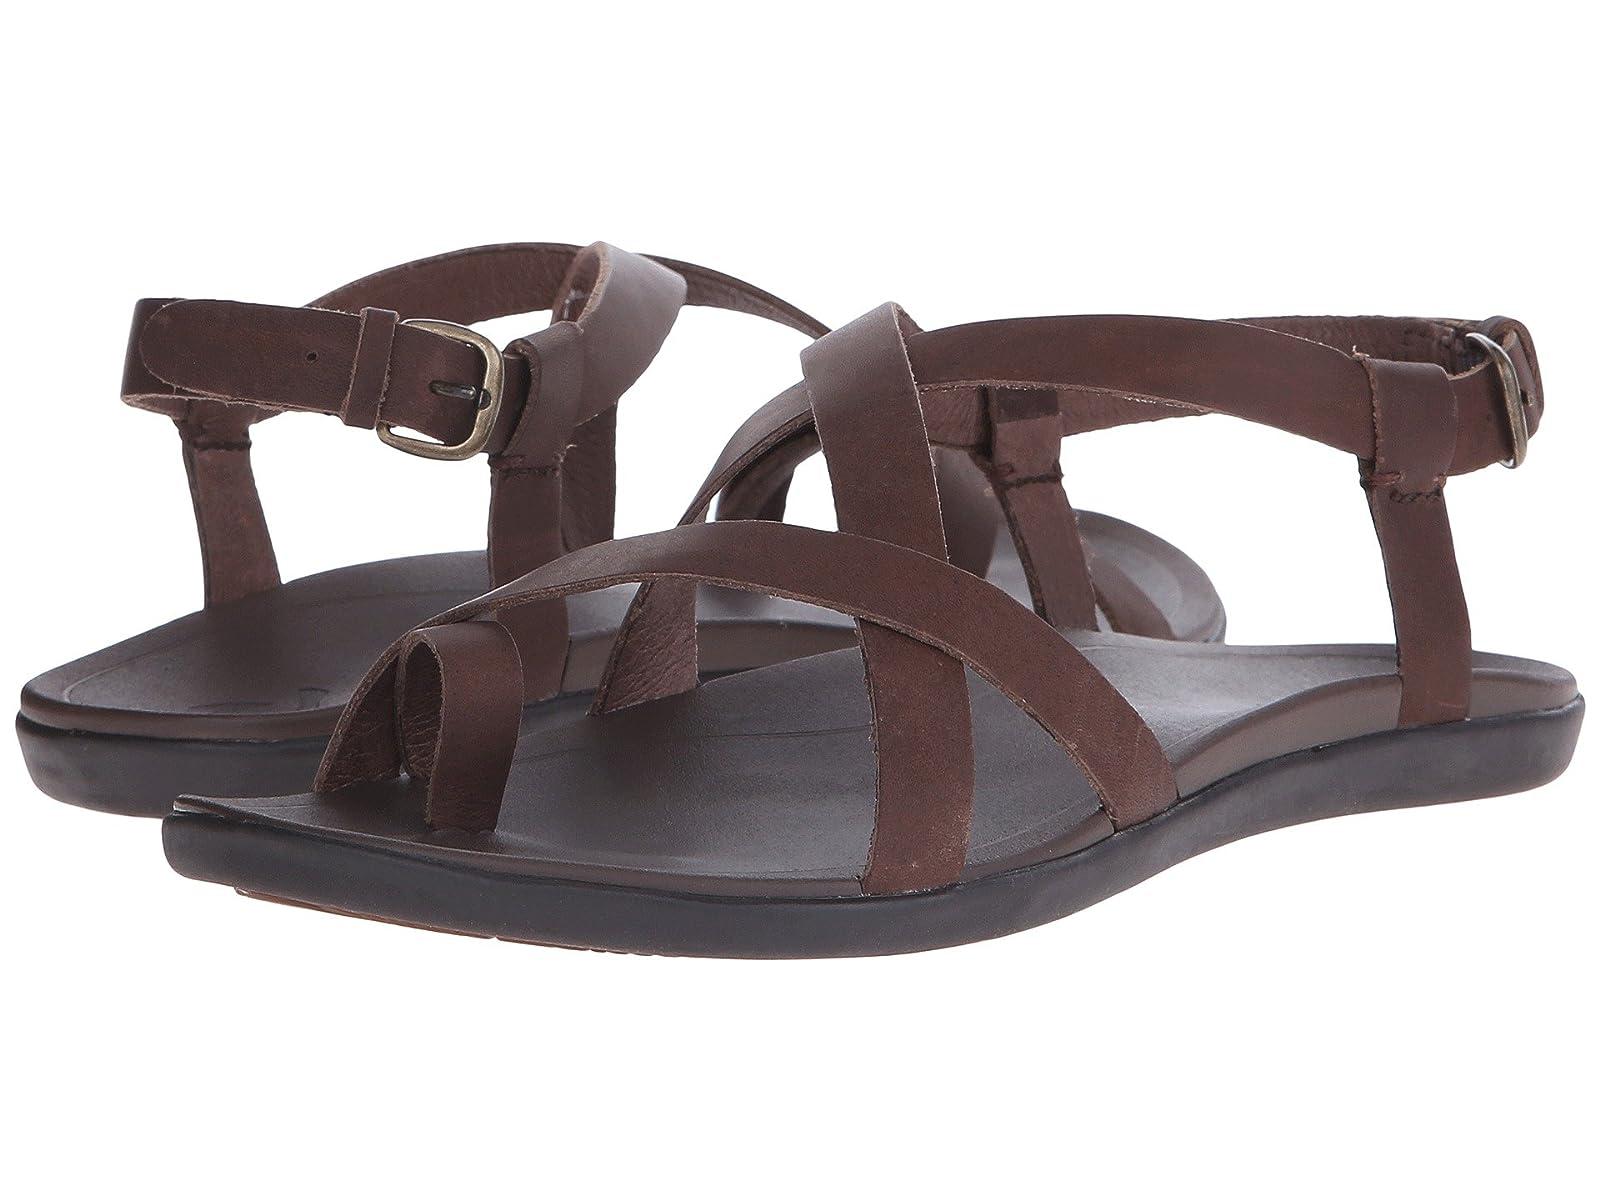 OluKai UpenaAtmospheric grades have affordable shoes